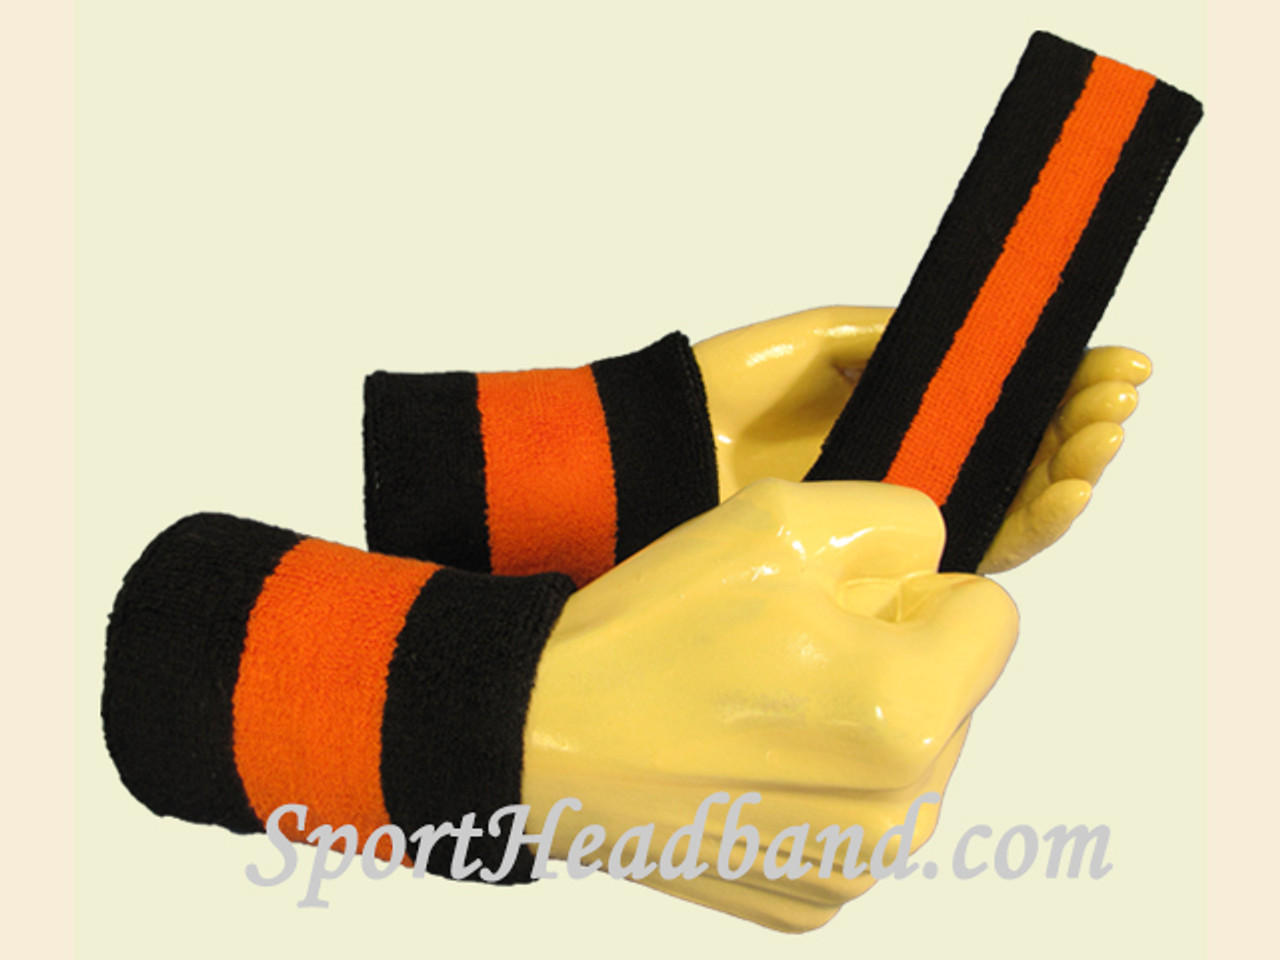 3a756027d62b Black Orange Black sports sweat headband wristbands Set - SportHeadband.com